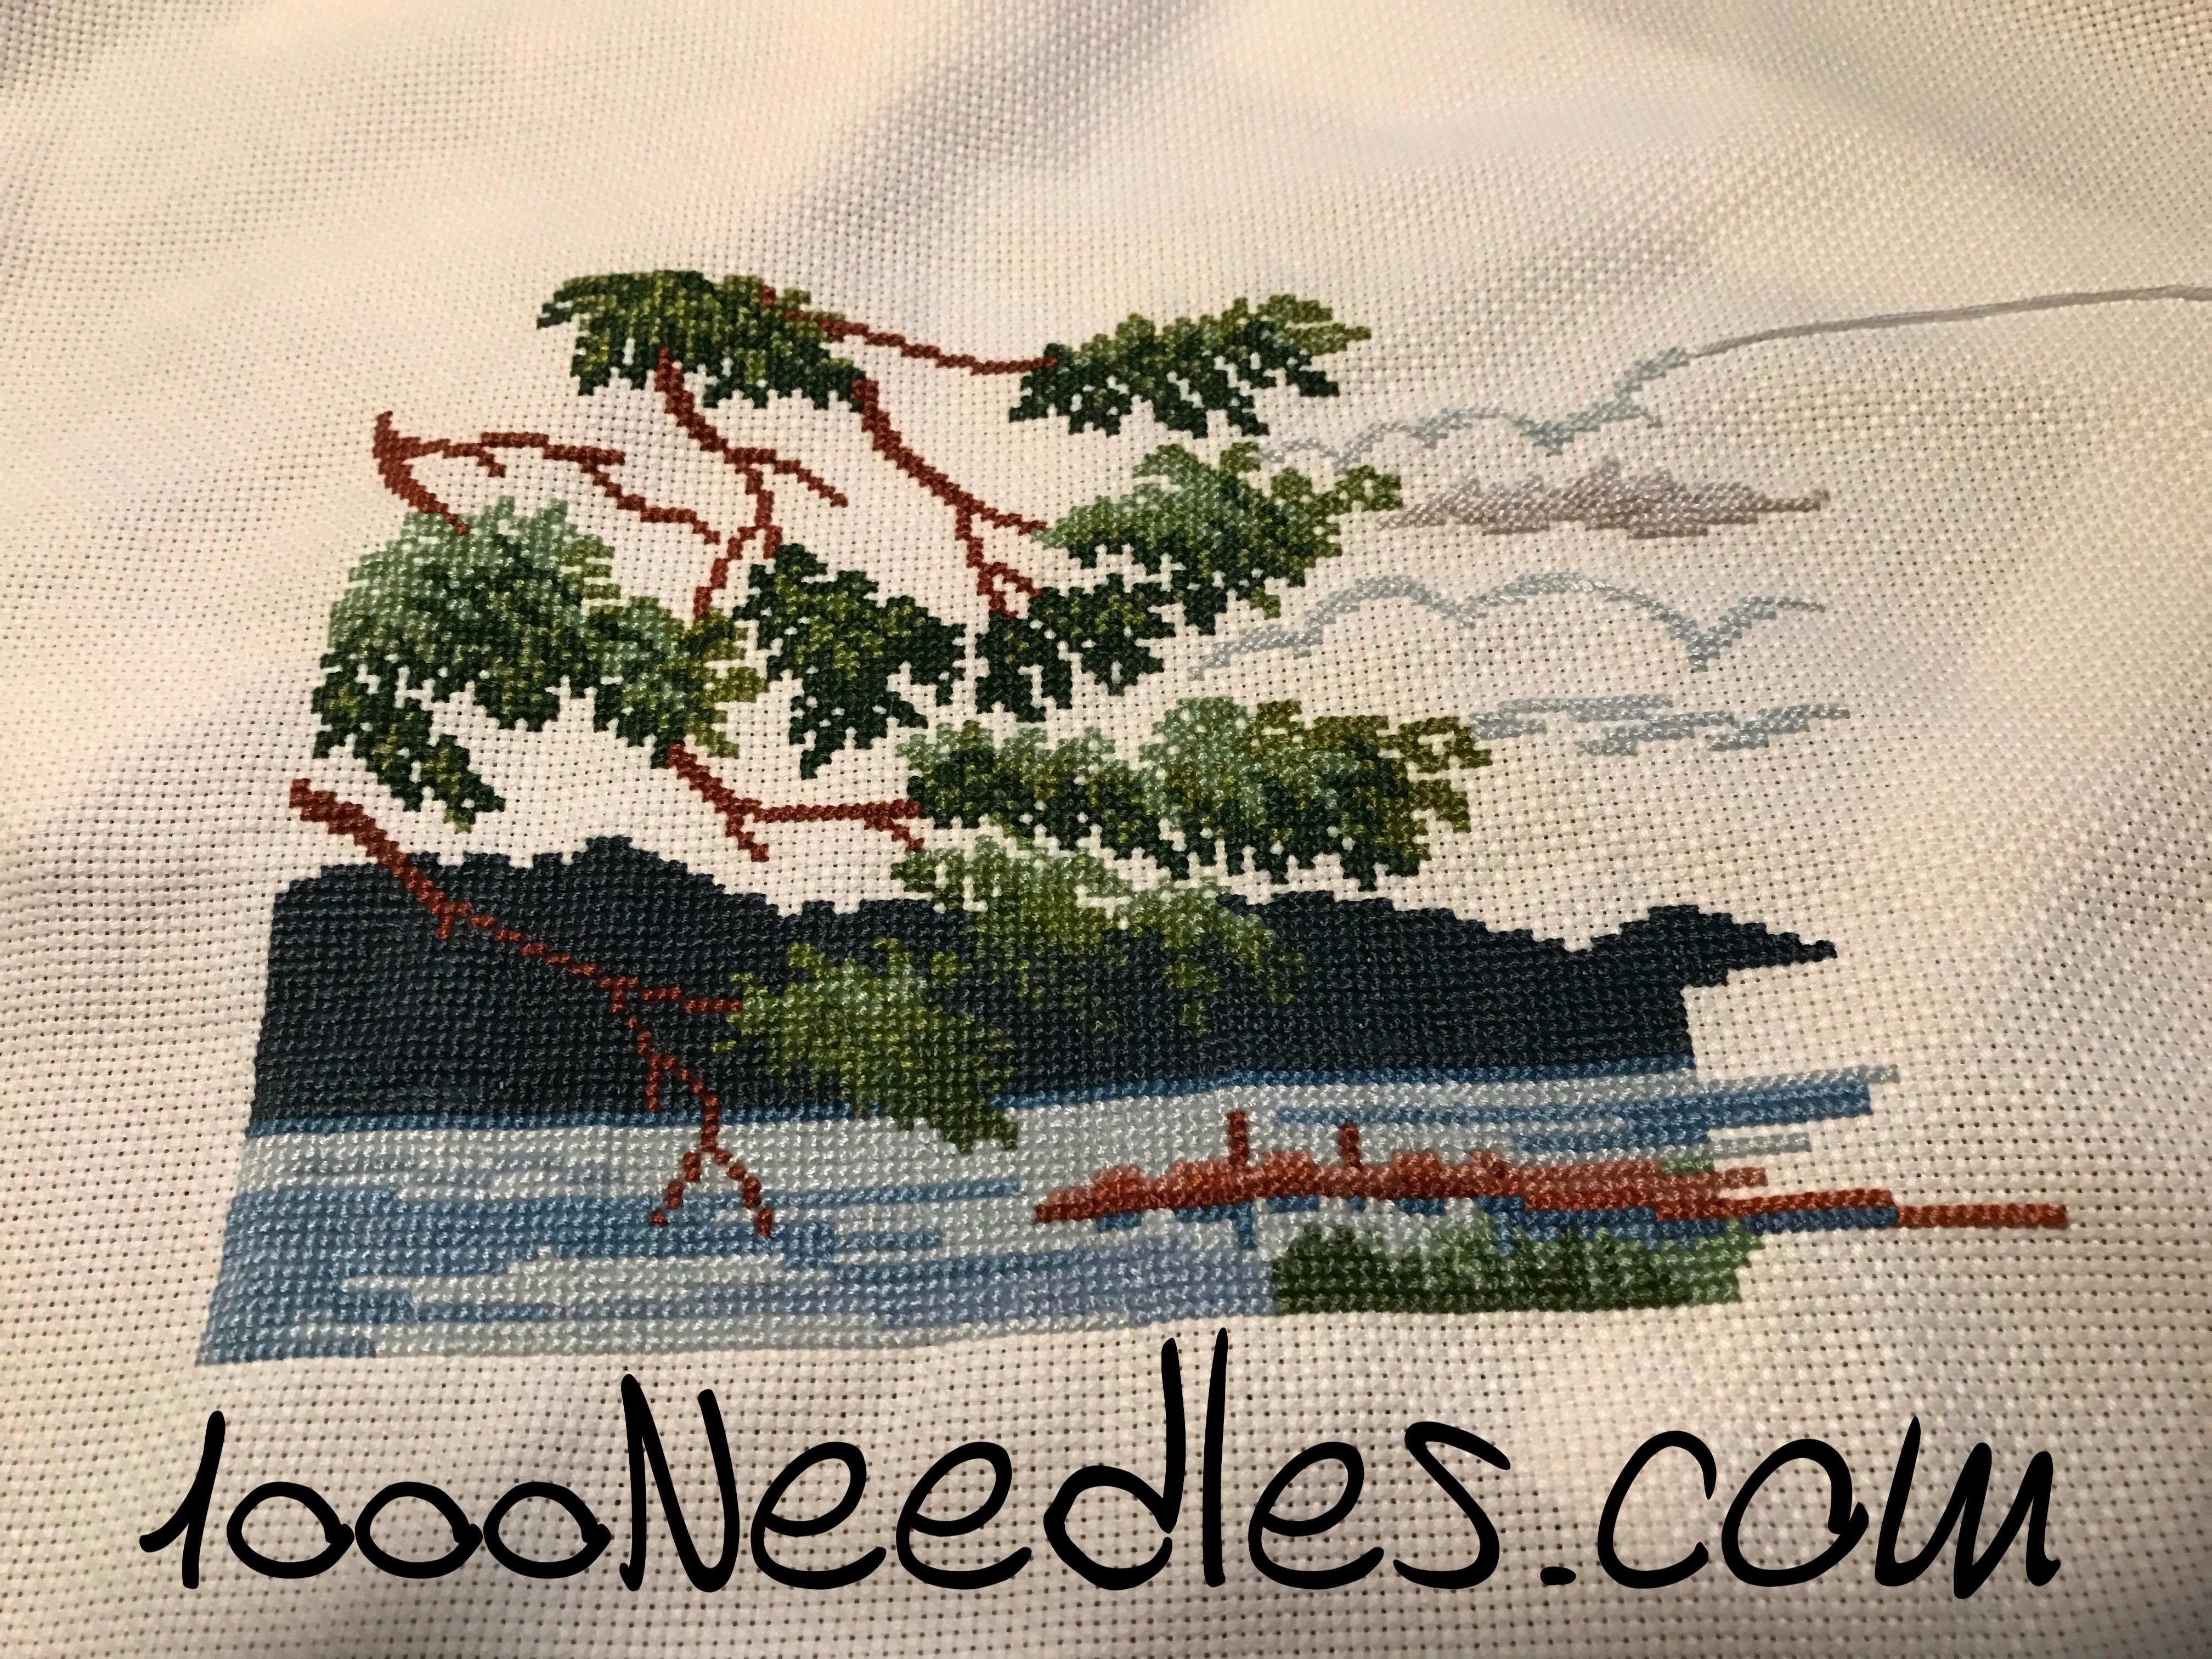 Knitting Expat Sock Club : Saturday musings thousand needles